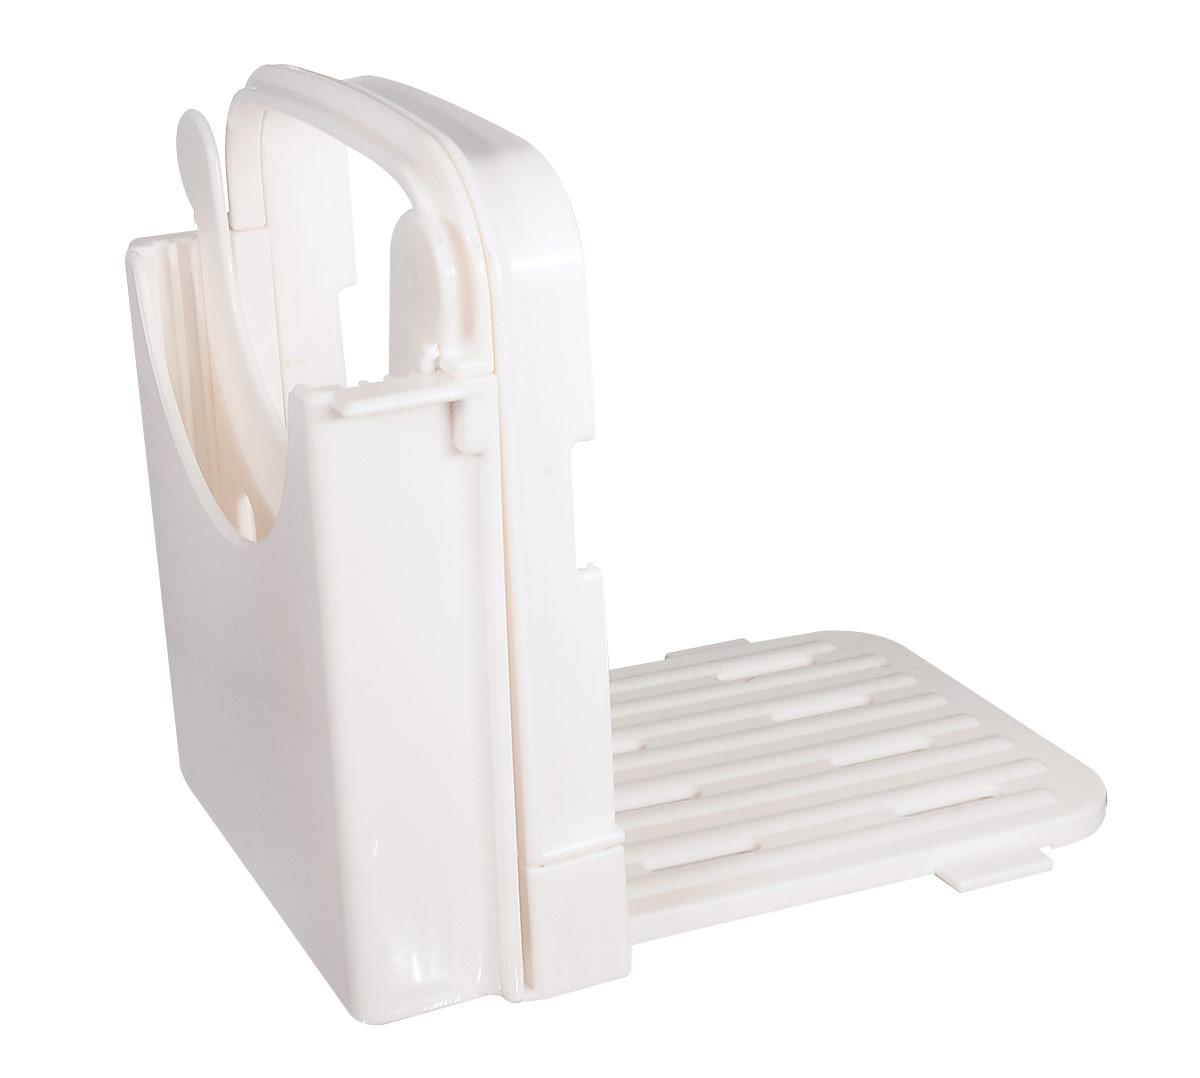 Bread Slicer Safety Cutter